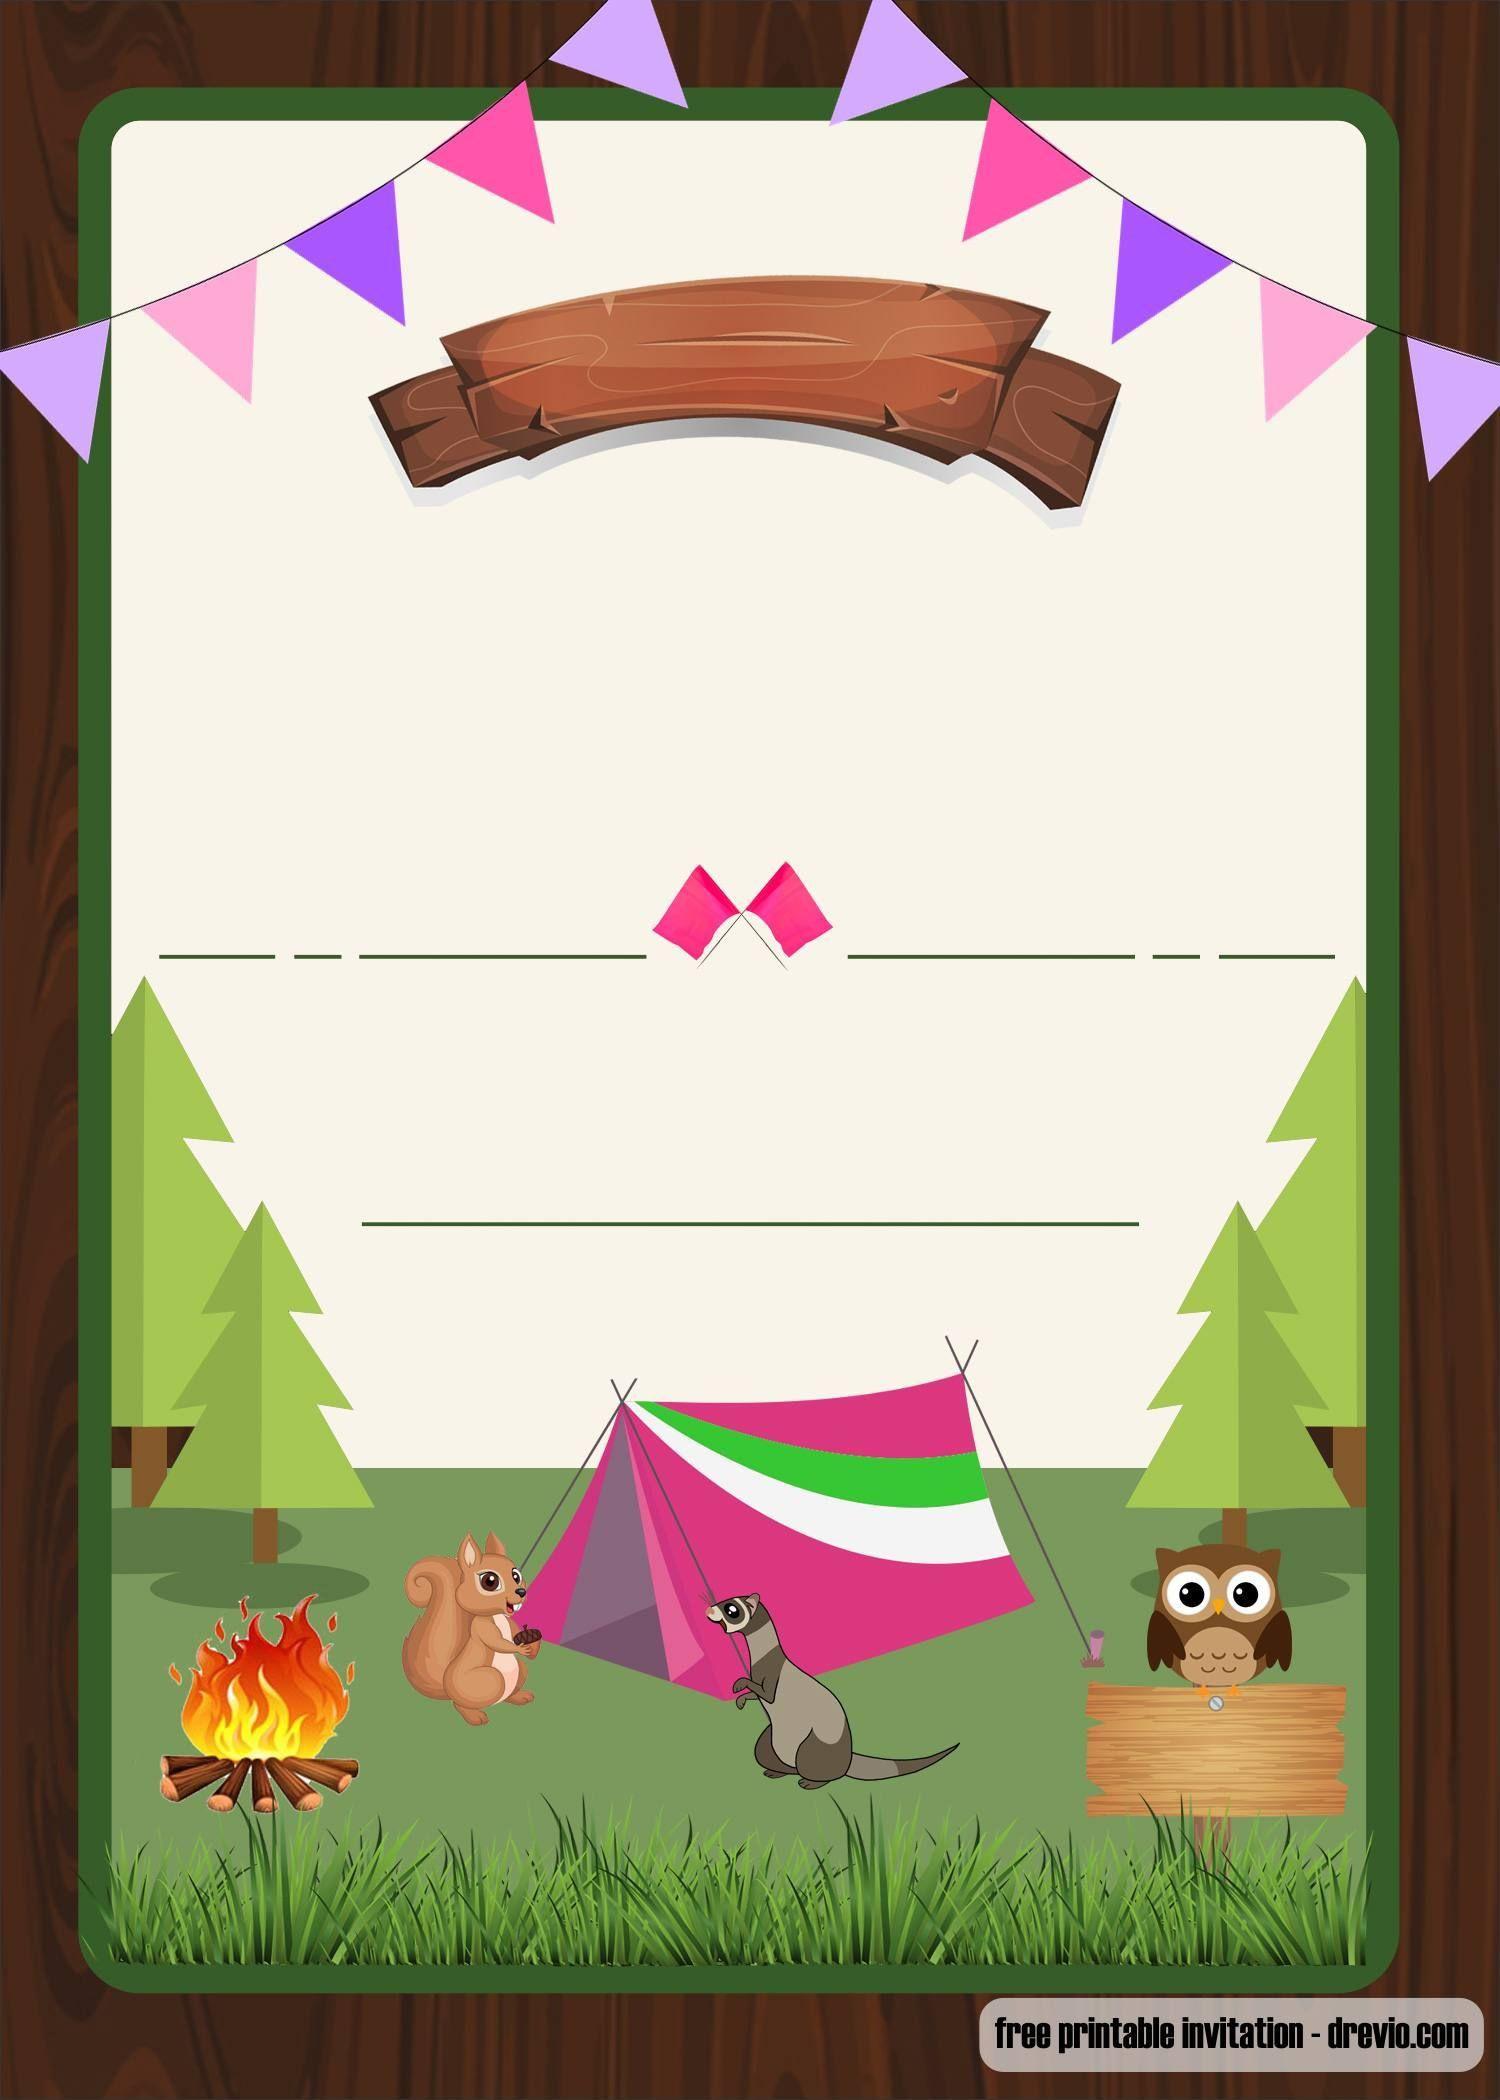 004 Wondrou Camping Invitation Template Free Example  Party BirthdayFull